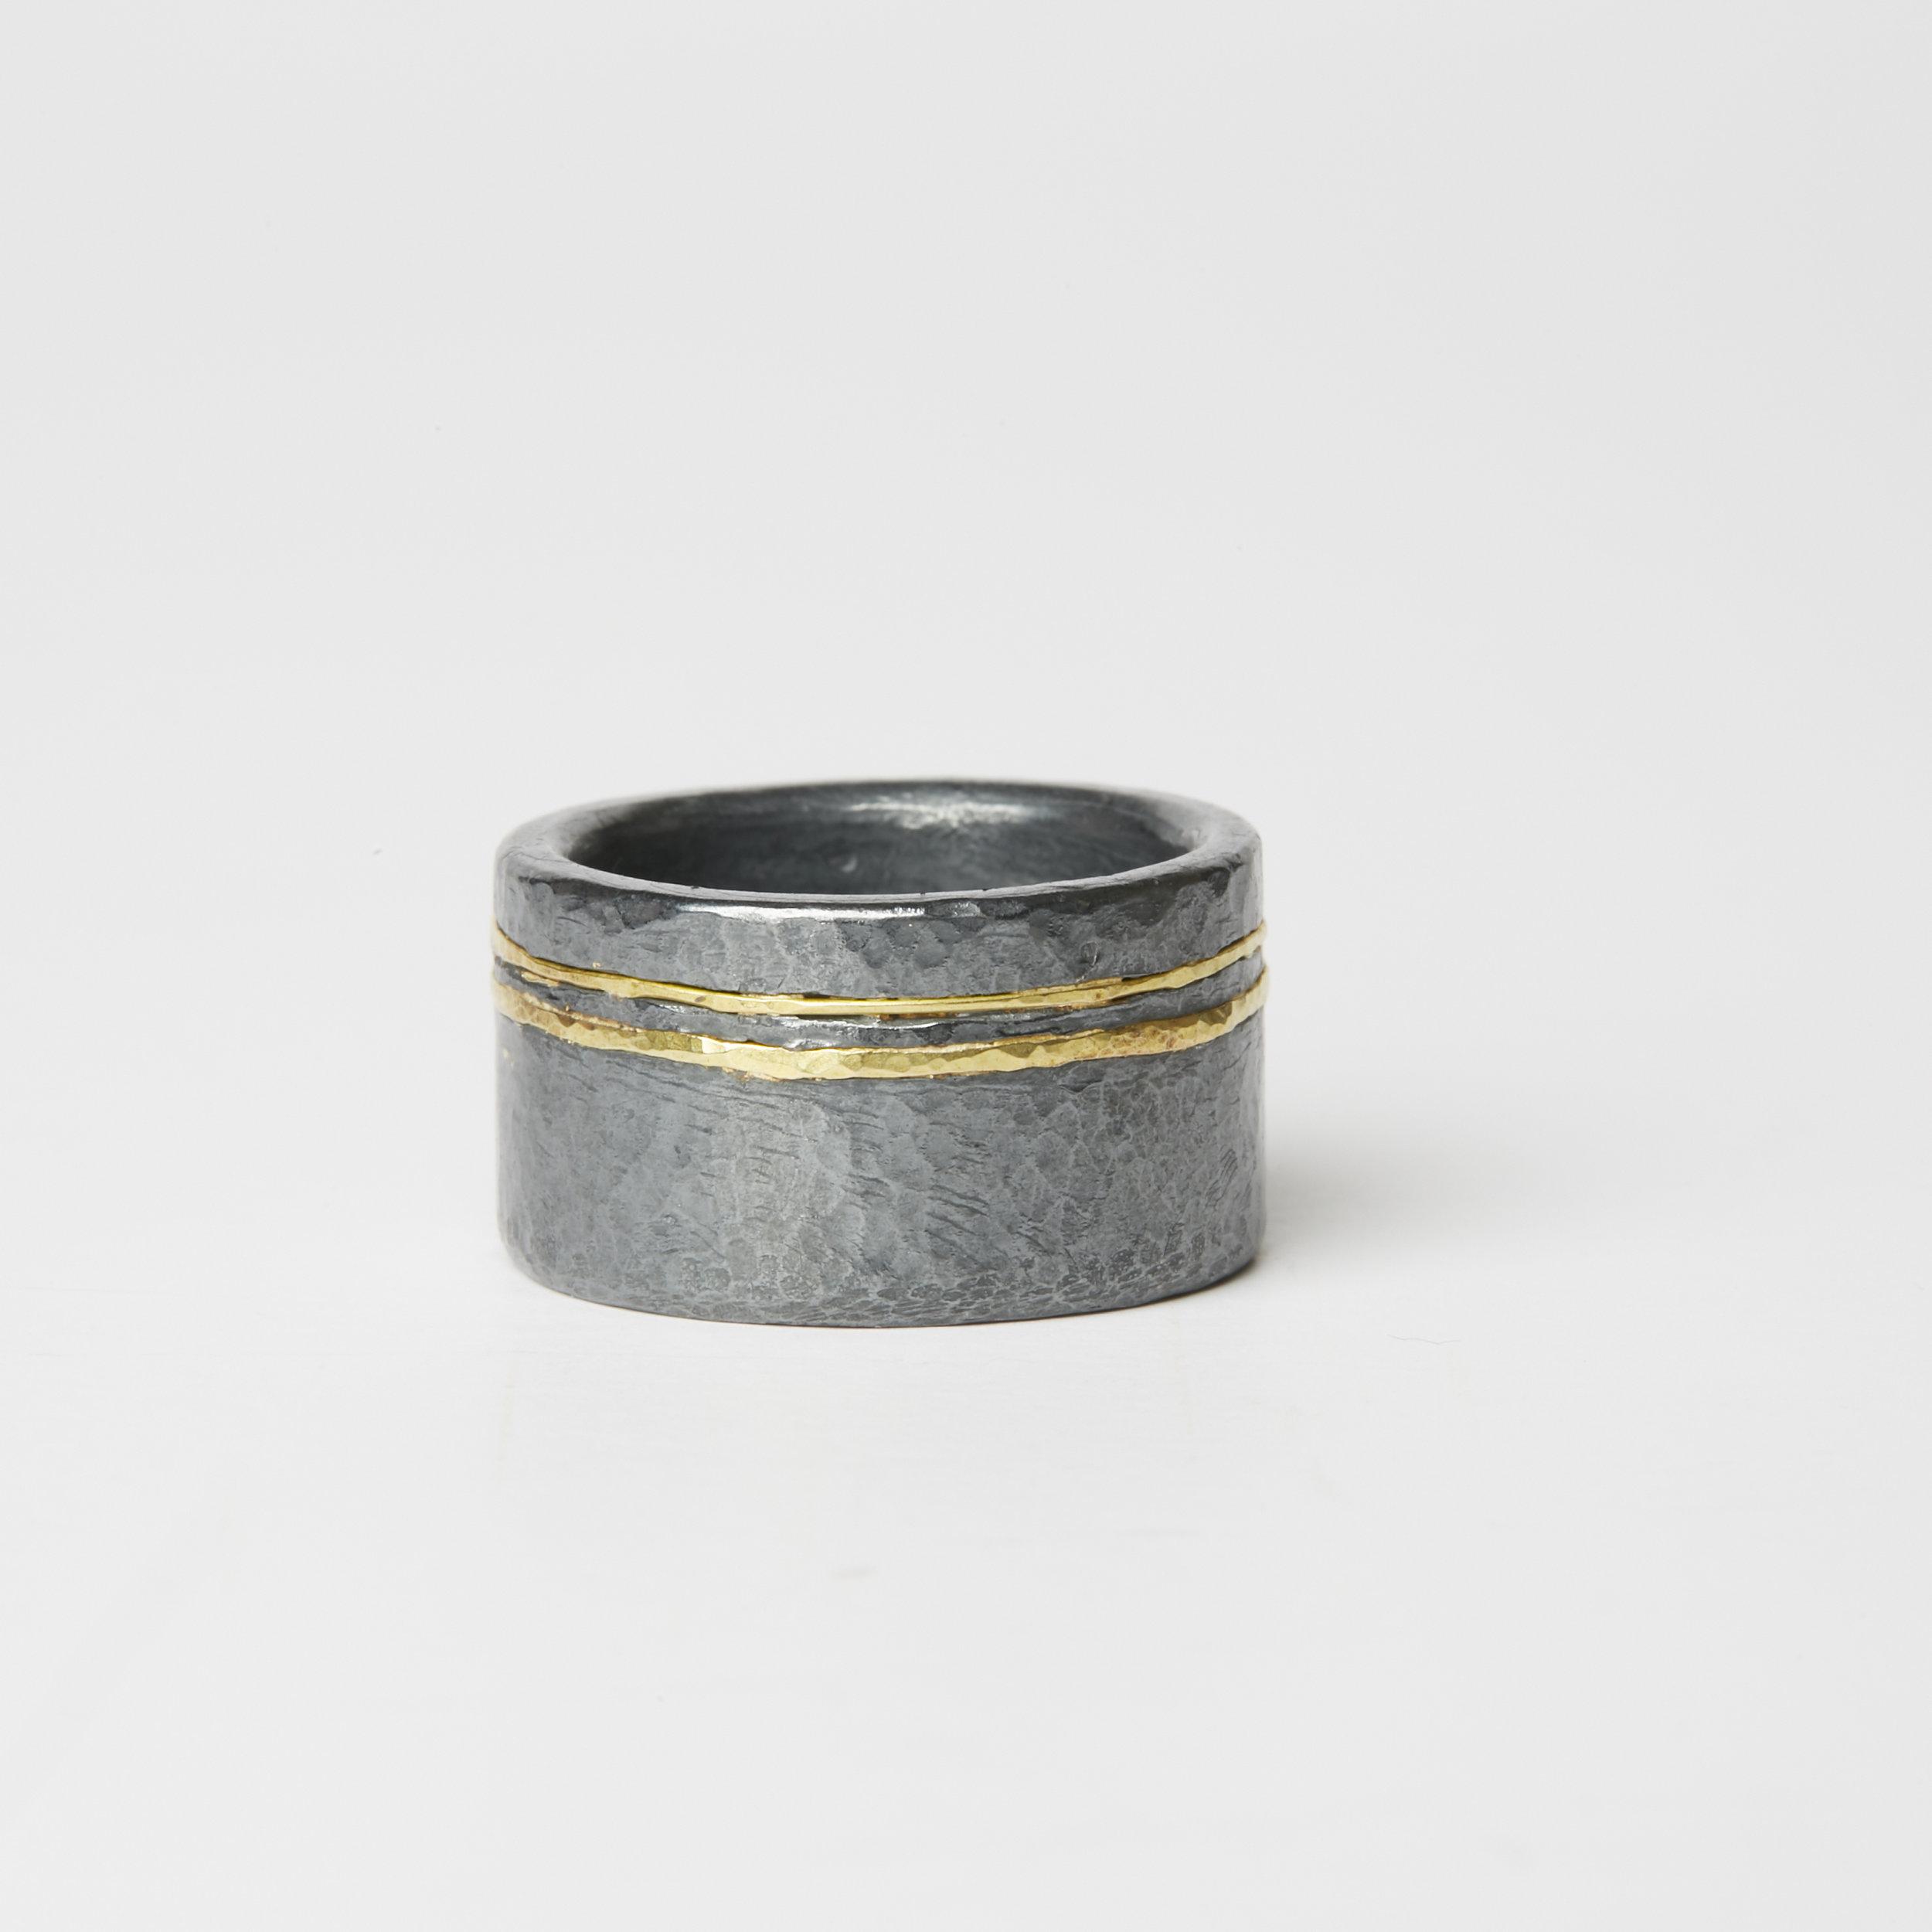 20181029_SonjaFries_Jewelry5684.jpg